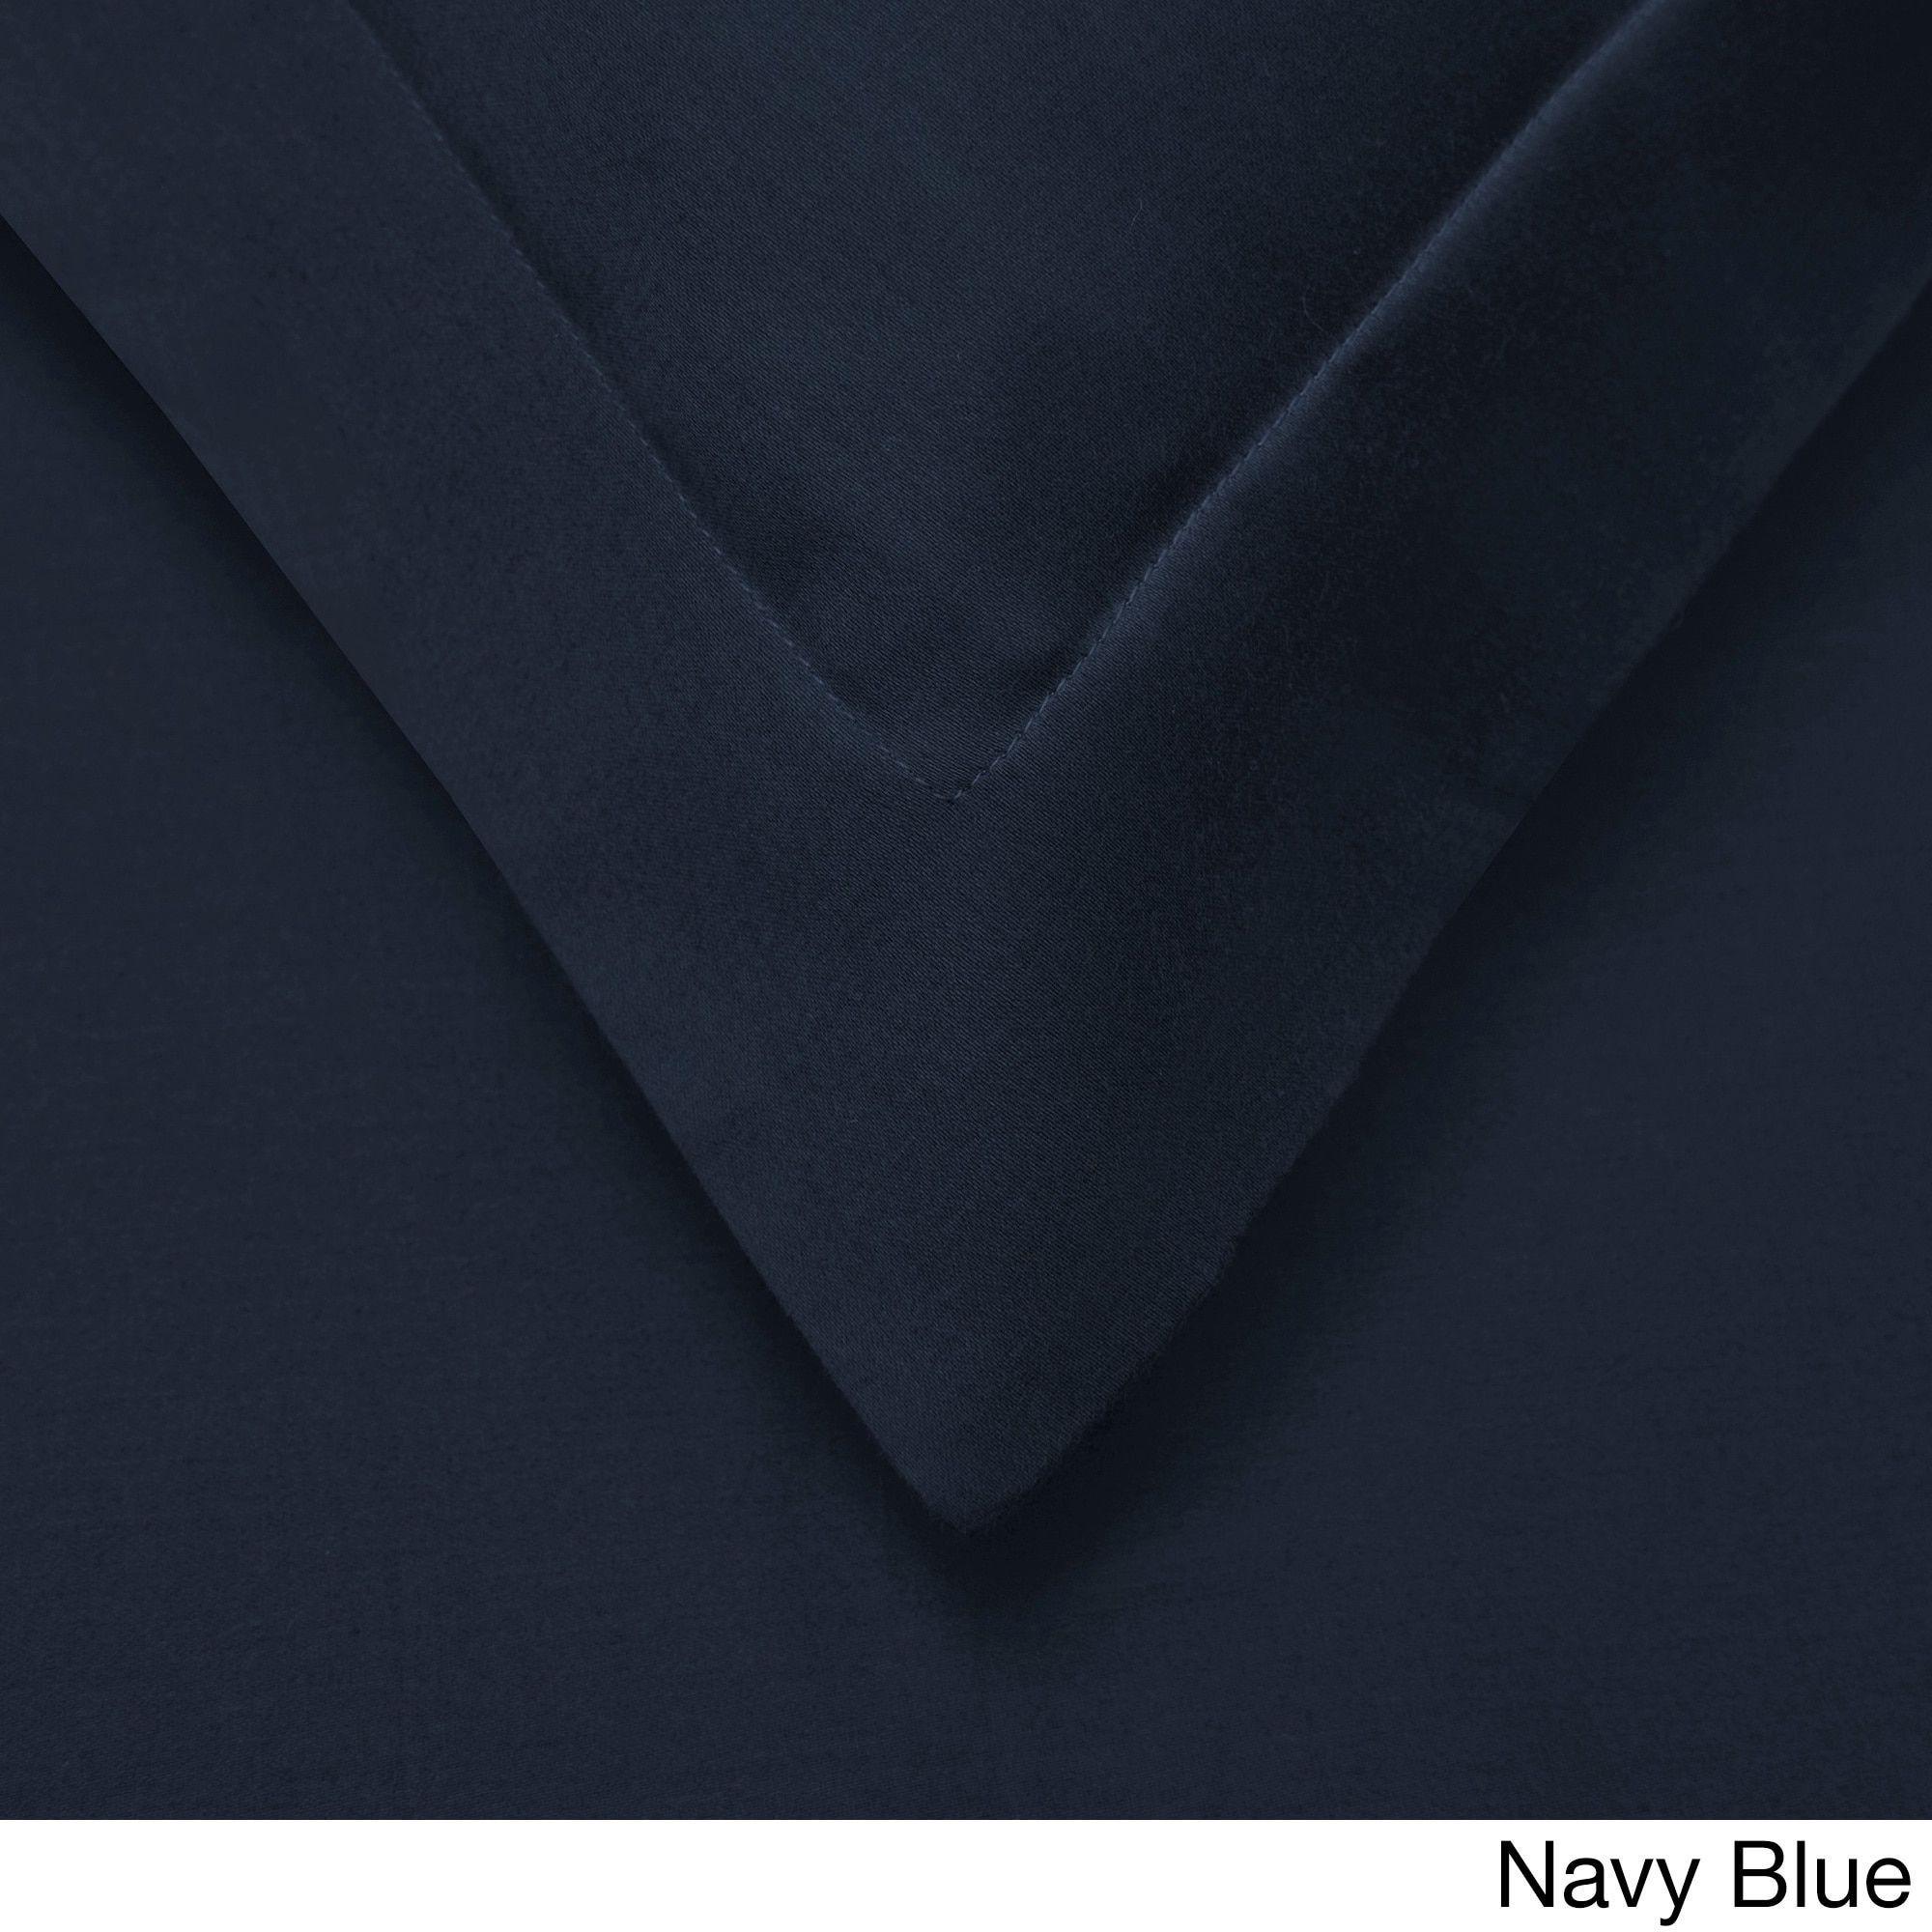 Superior 1000 Thread Count Wrinkle Resistant 3-piece Duvet Cover Set